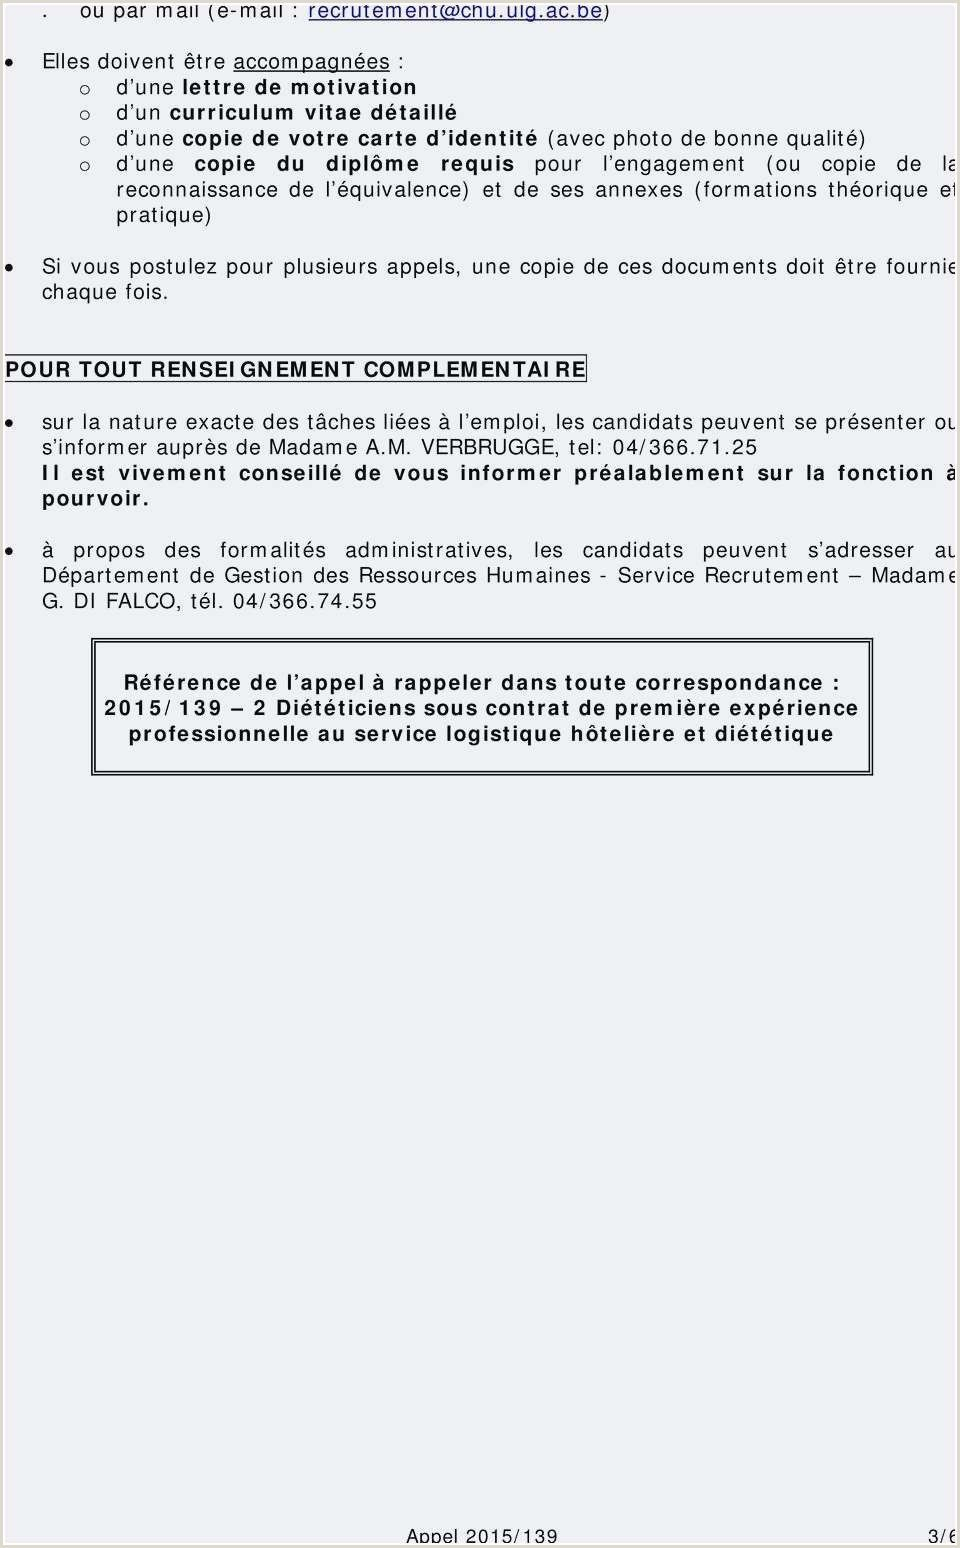 Exemple De Cv Receptionniste Hotel In 2020 Resume Words Cv Words Resume Format In Word